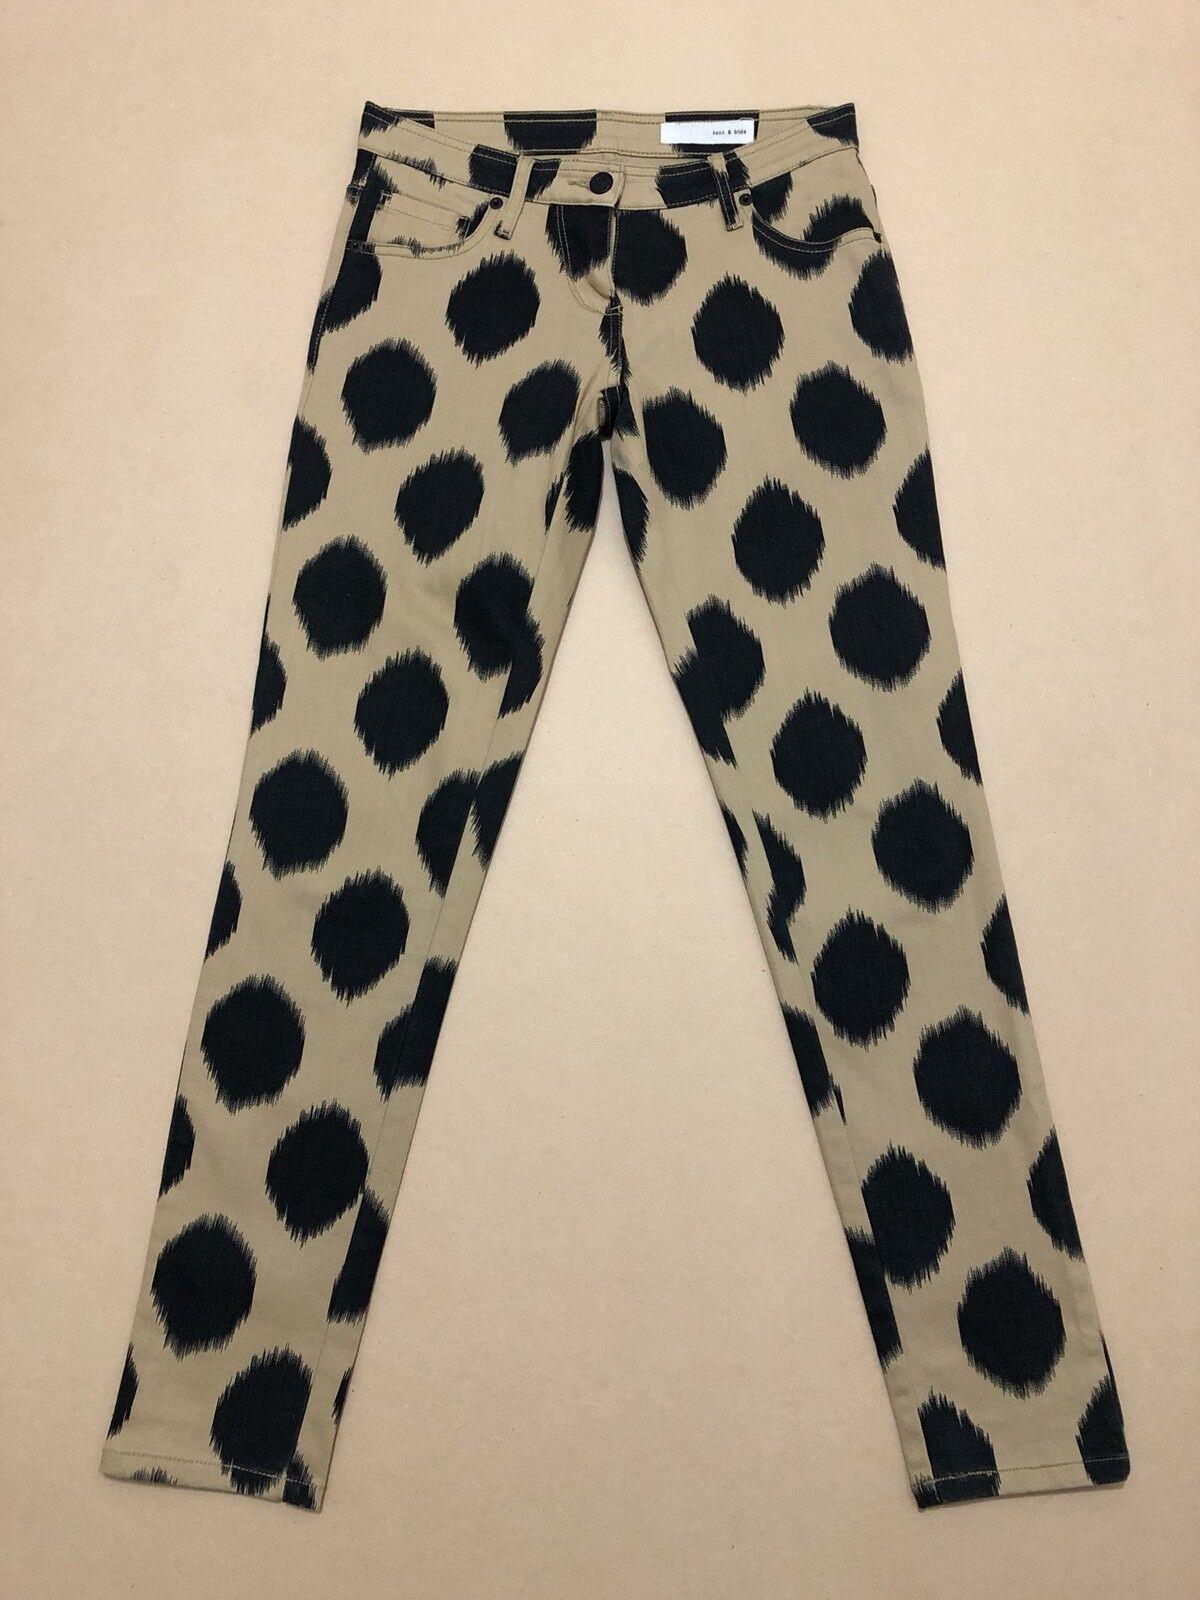 Sass & Bide Jeans  25   AU 6 - 7  Great Cond Seekerstate Denim Pants w  Dots